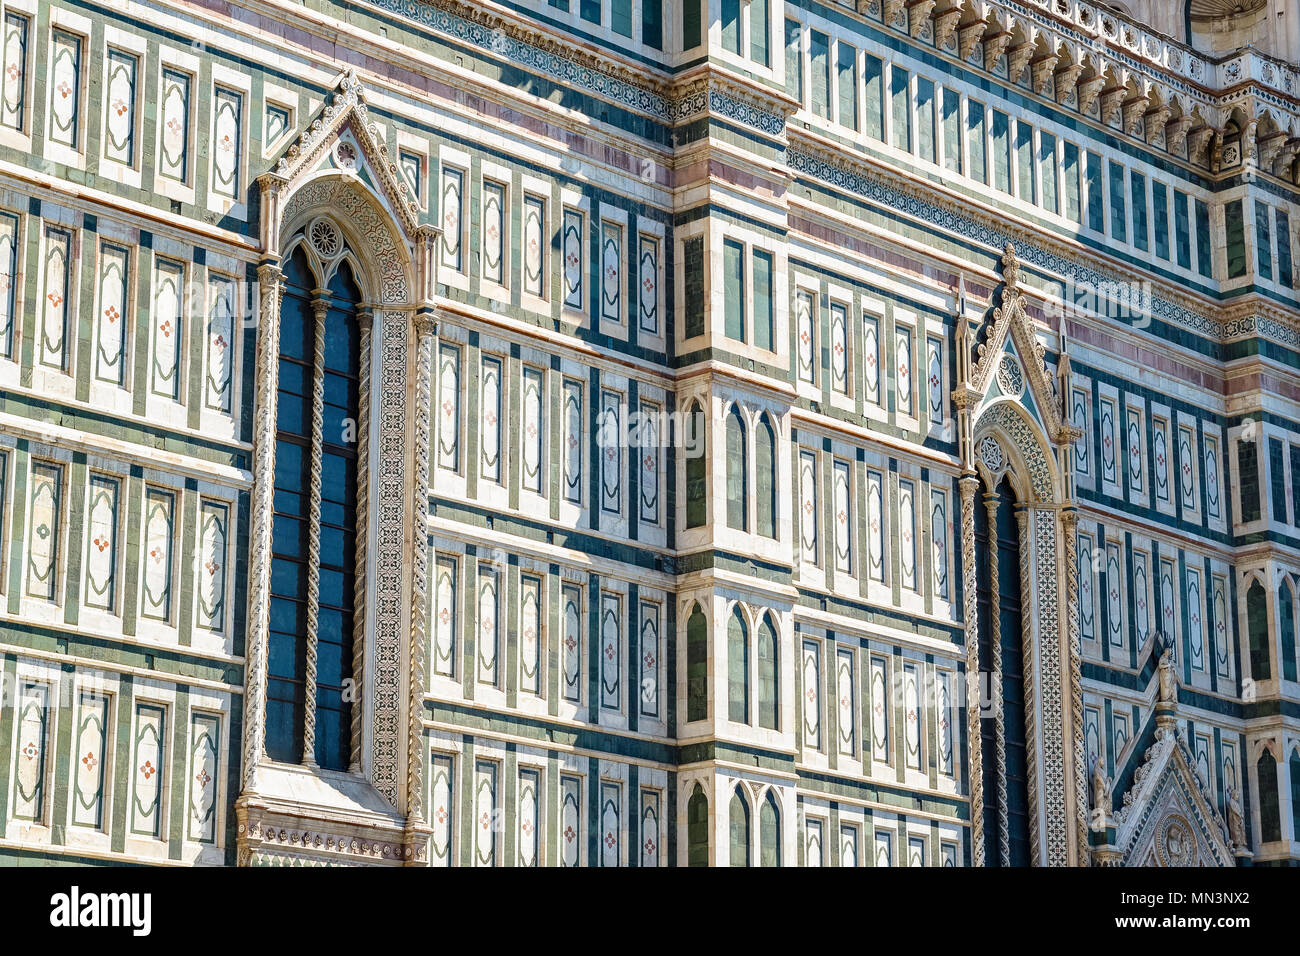 Fassade der Kathedrale Santa Maria del Fiore (Kathedrale der Heiligen Maria der Blume) in Florenz, Italien Stockbild